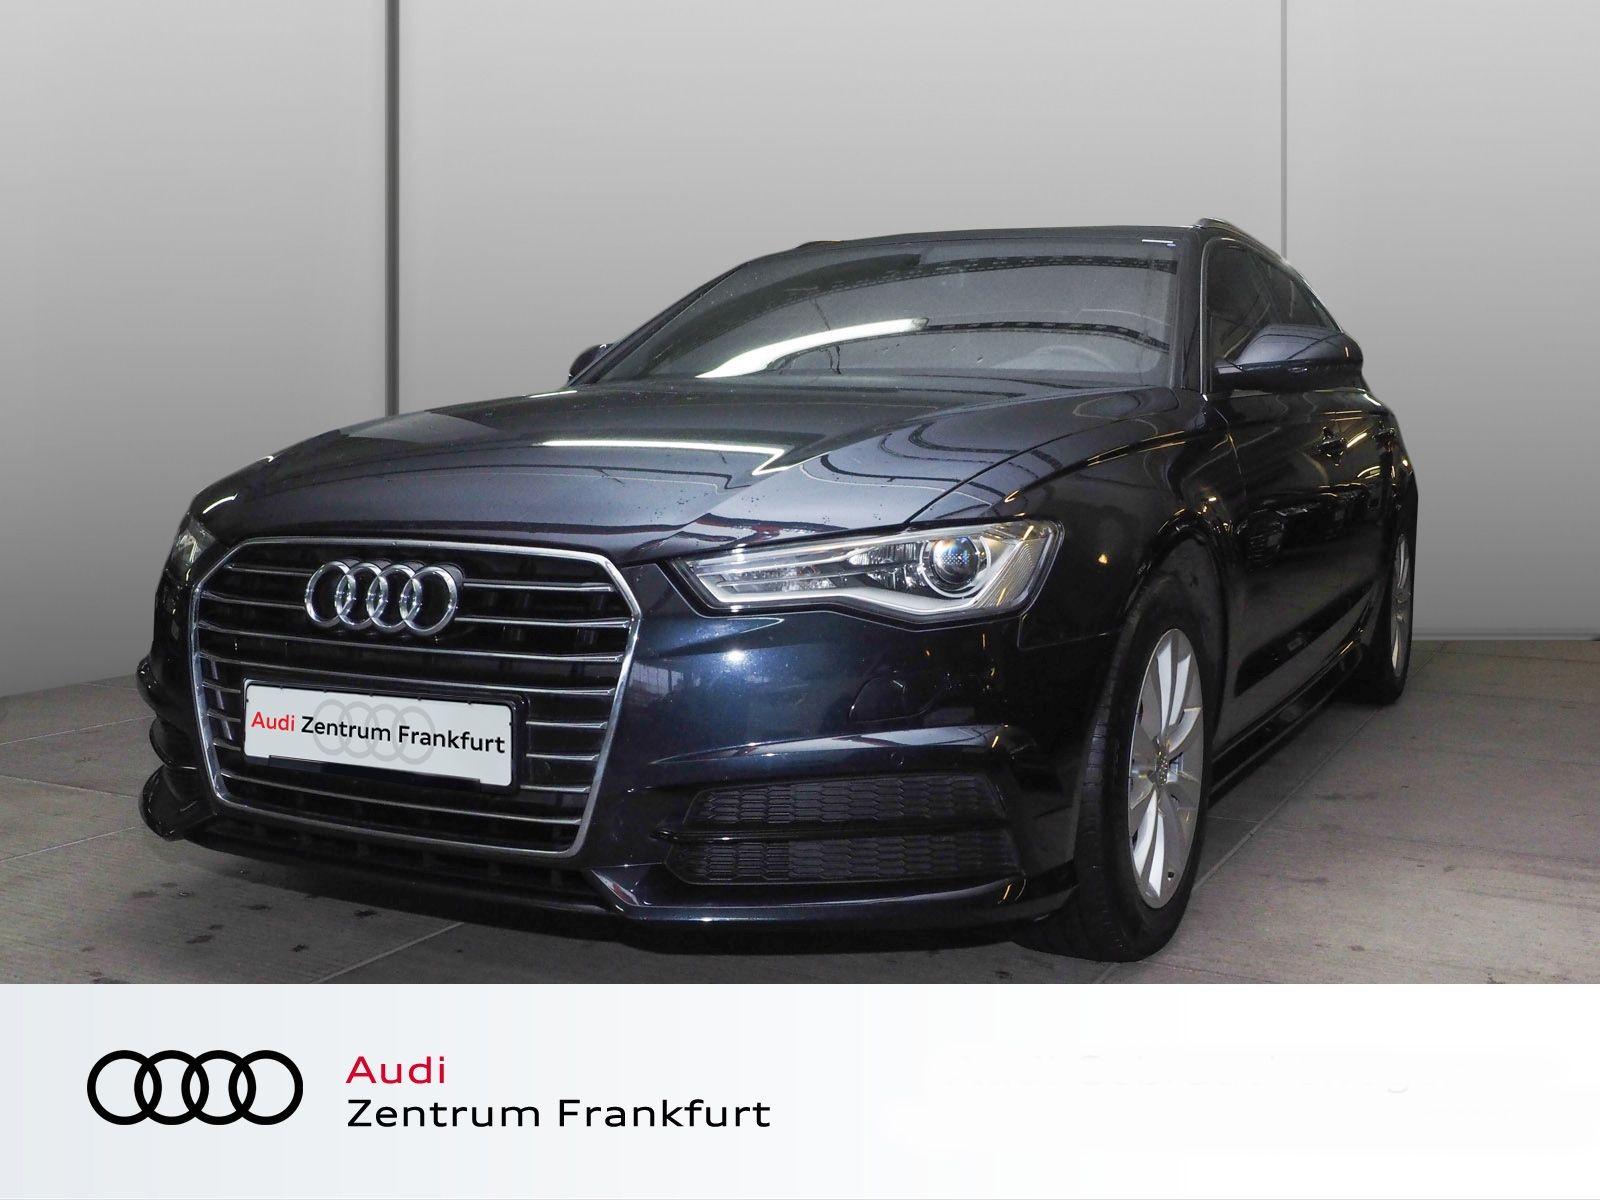 Audi A6 Avant 2.0 TDI S tronic Xenon Navi PDC Sitzheizung, Jahr 2016, Diesel